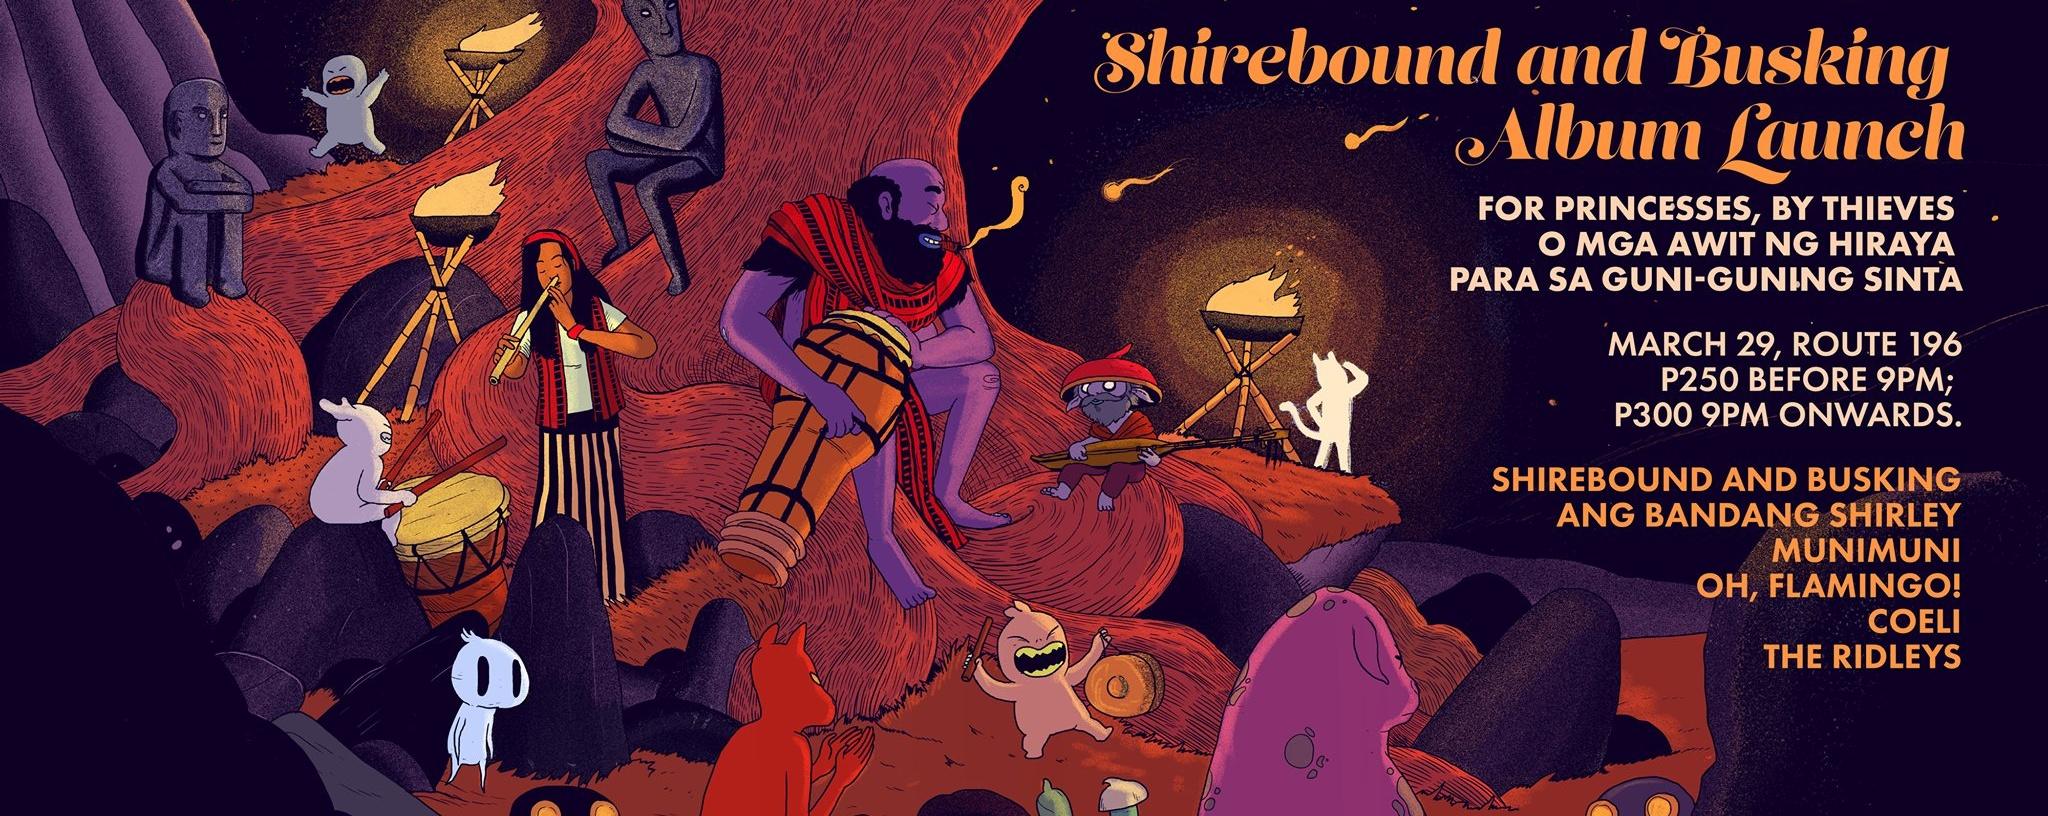 Shirebound and Busking ALBUM Launch